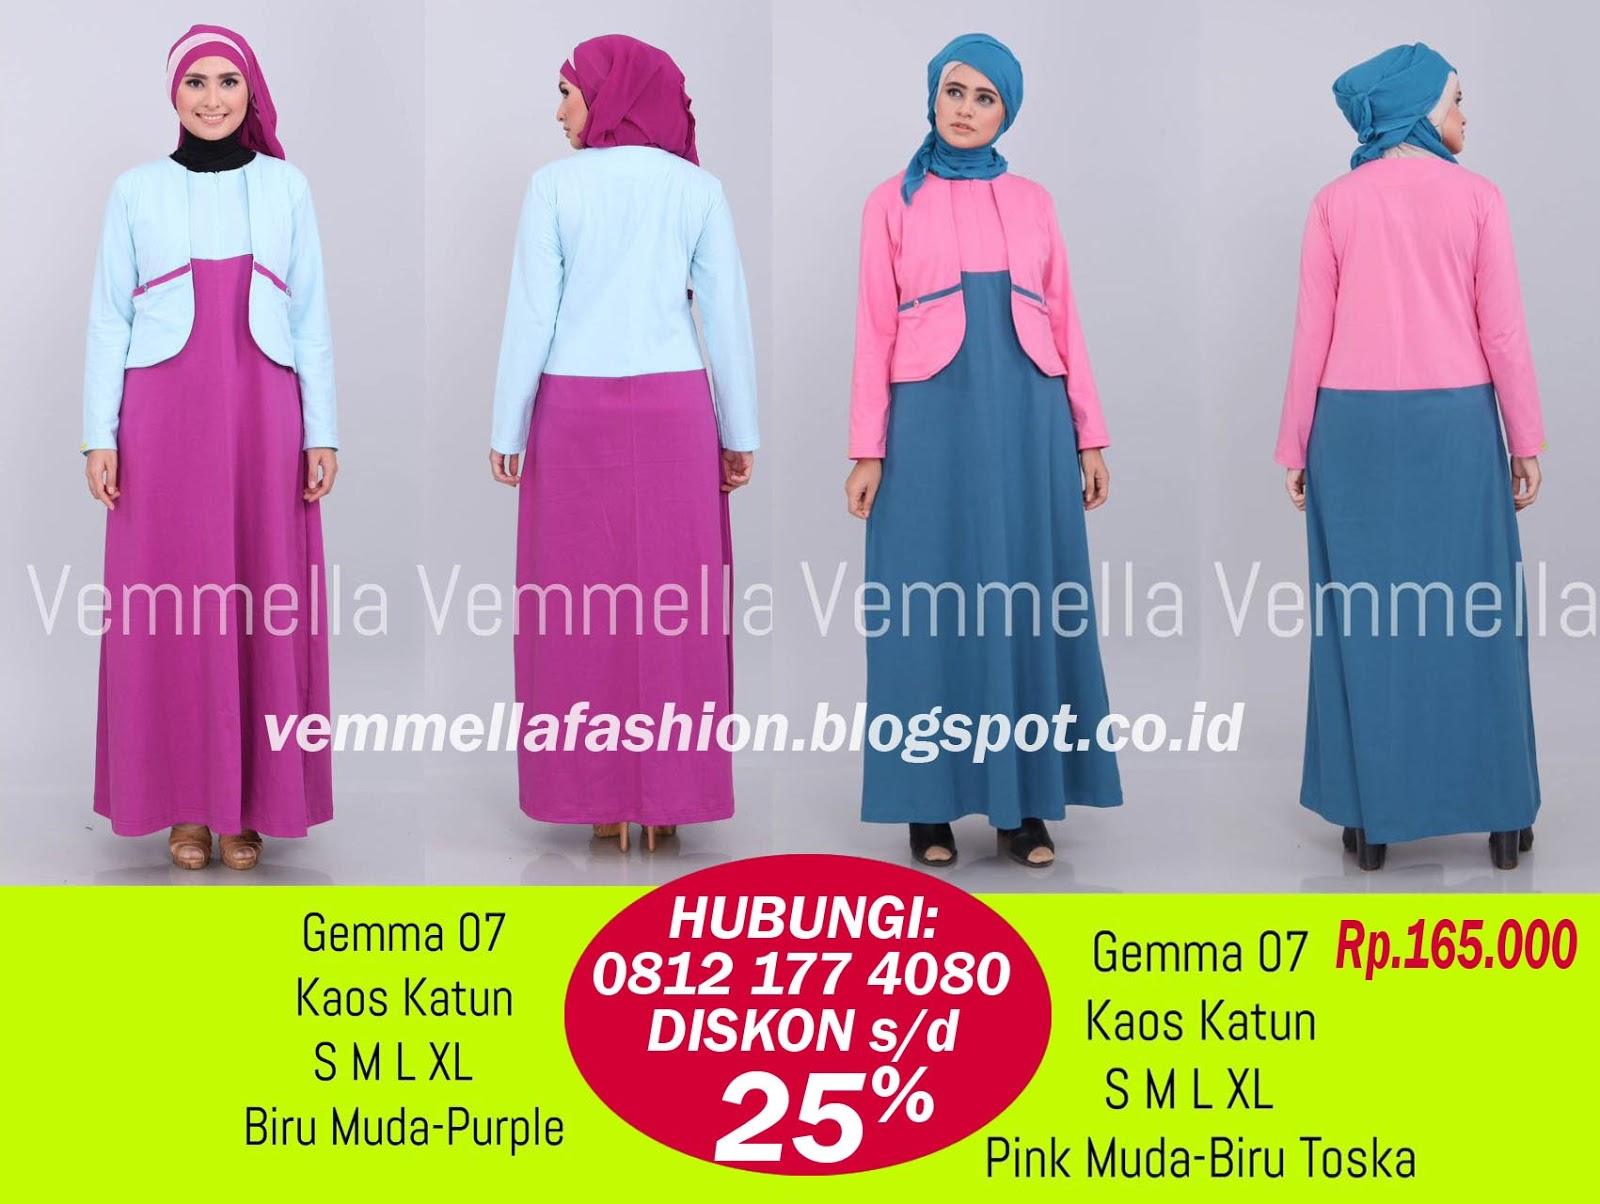 Katalog vemmella baju kaos gamis atasan 0856 4864 8202 Baju gamis elif